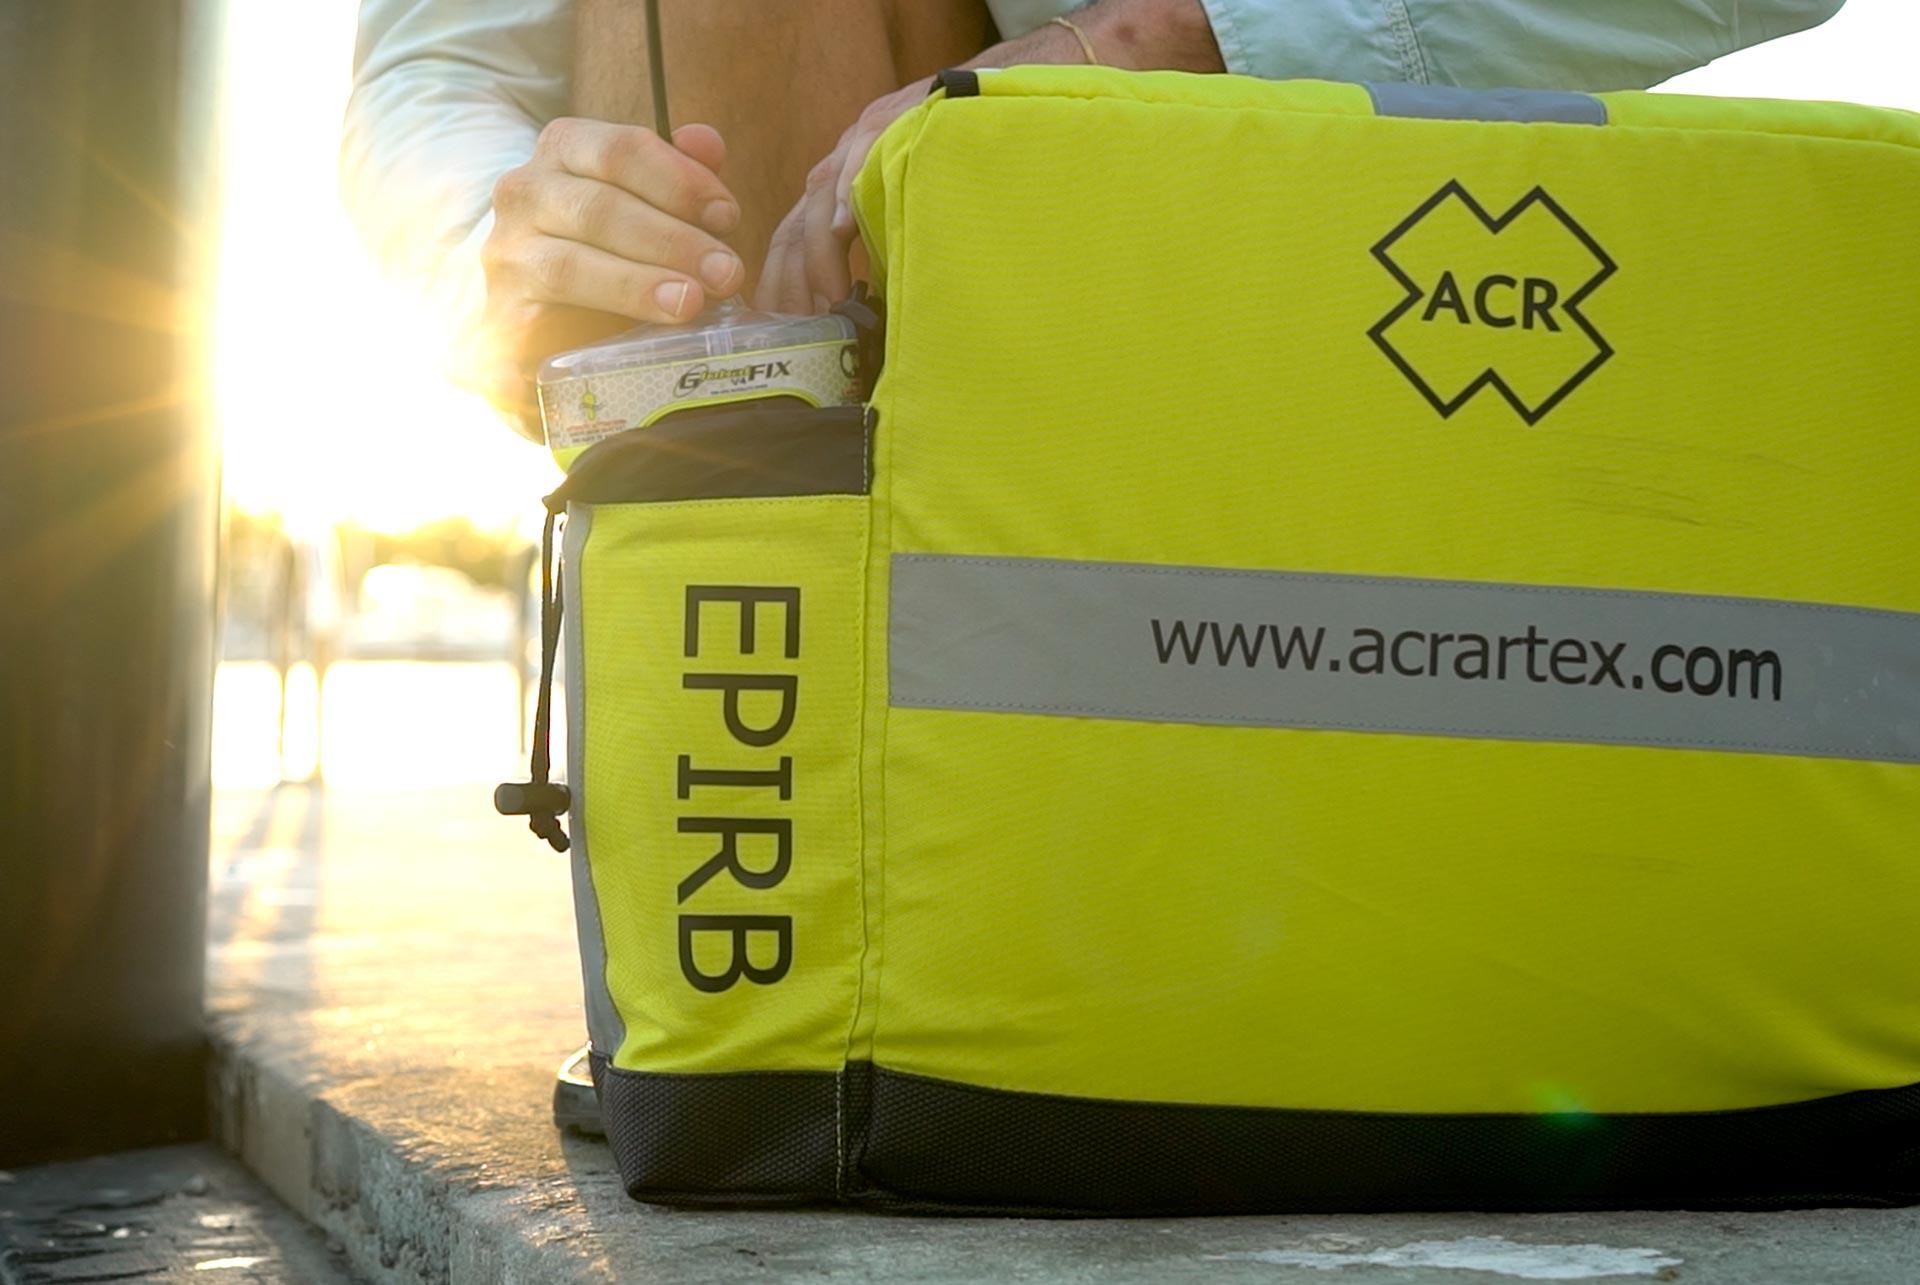 Acrartex news ditchbag hero